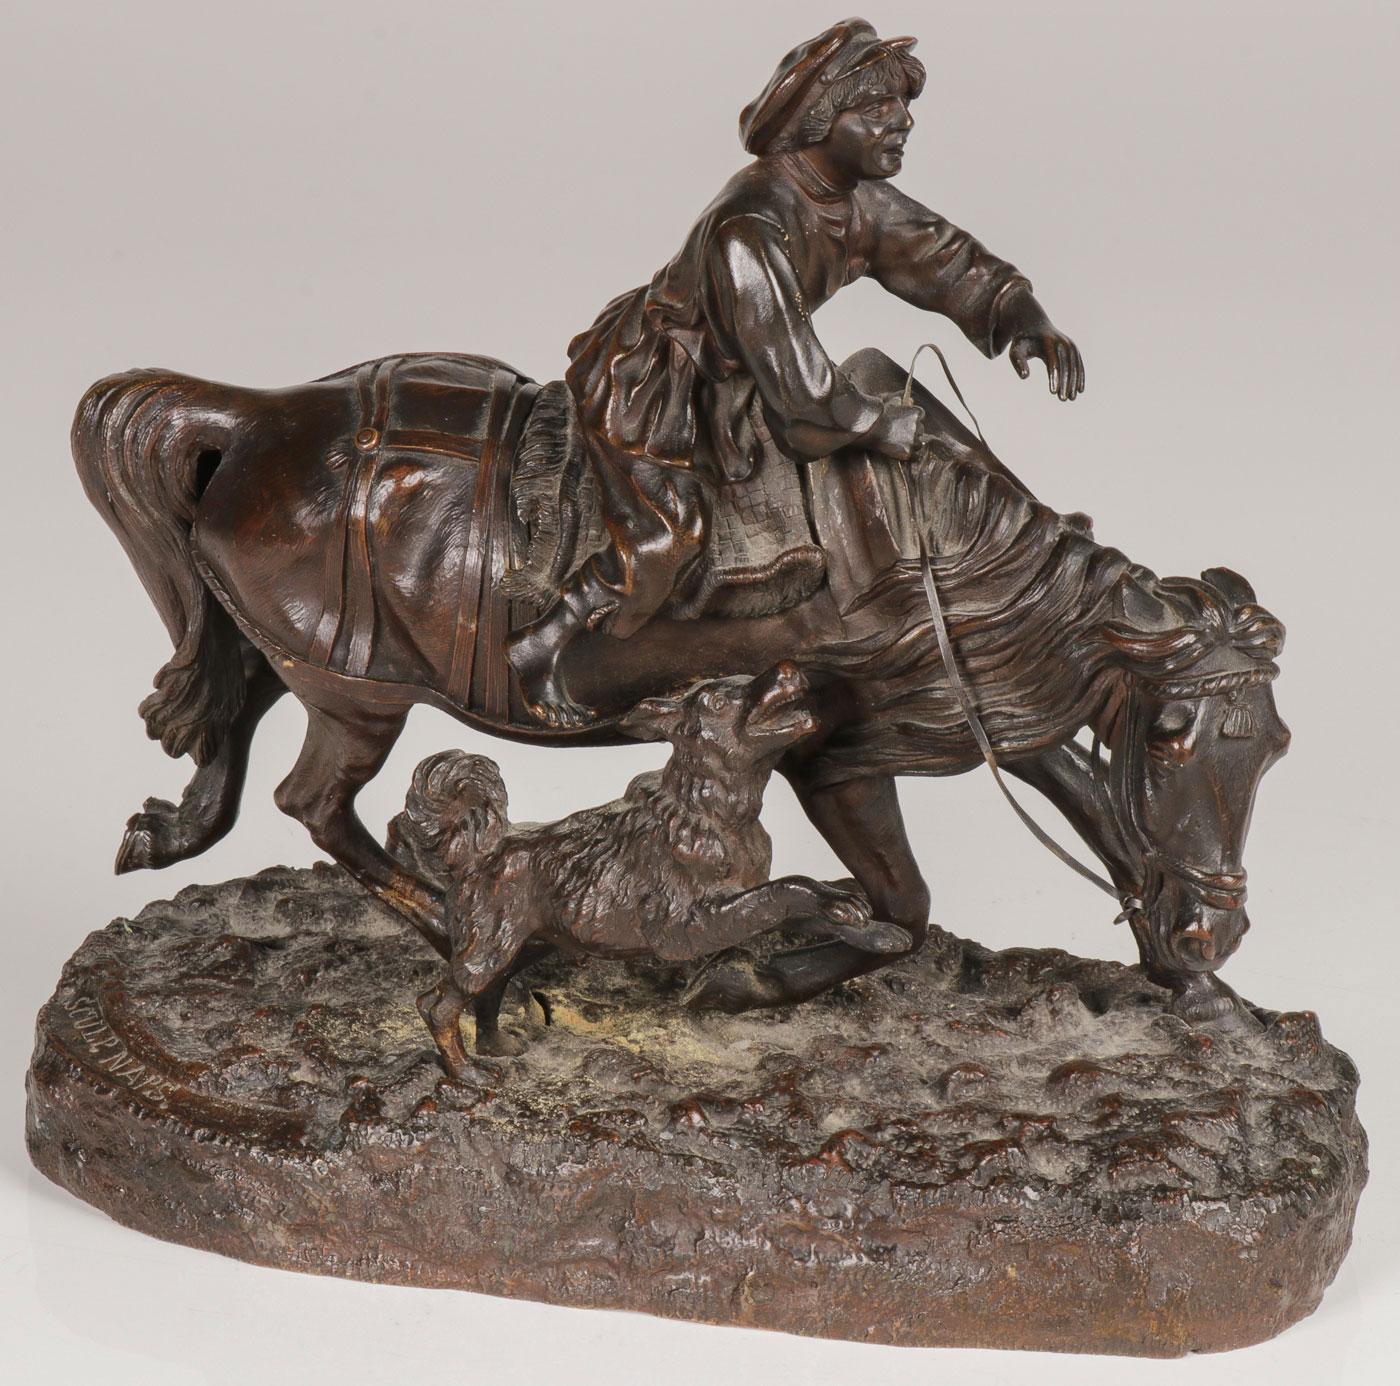 eugeny-naps - barefoot-boy-naps-russian-sculptore-bronze